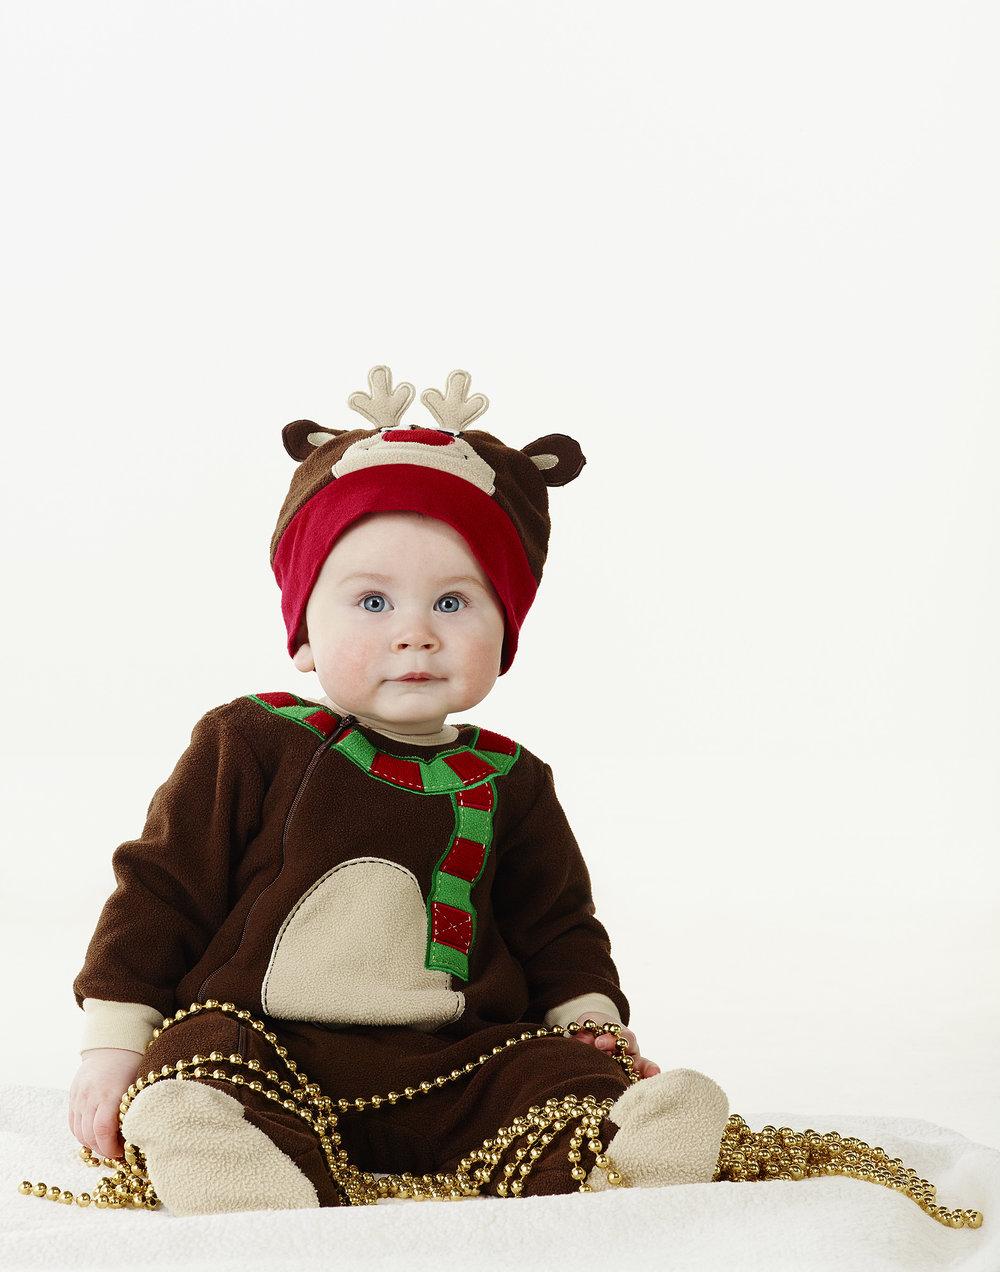 Baby Jack_7437.jpg